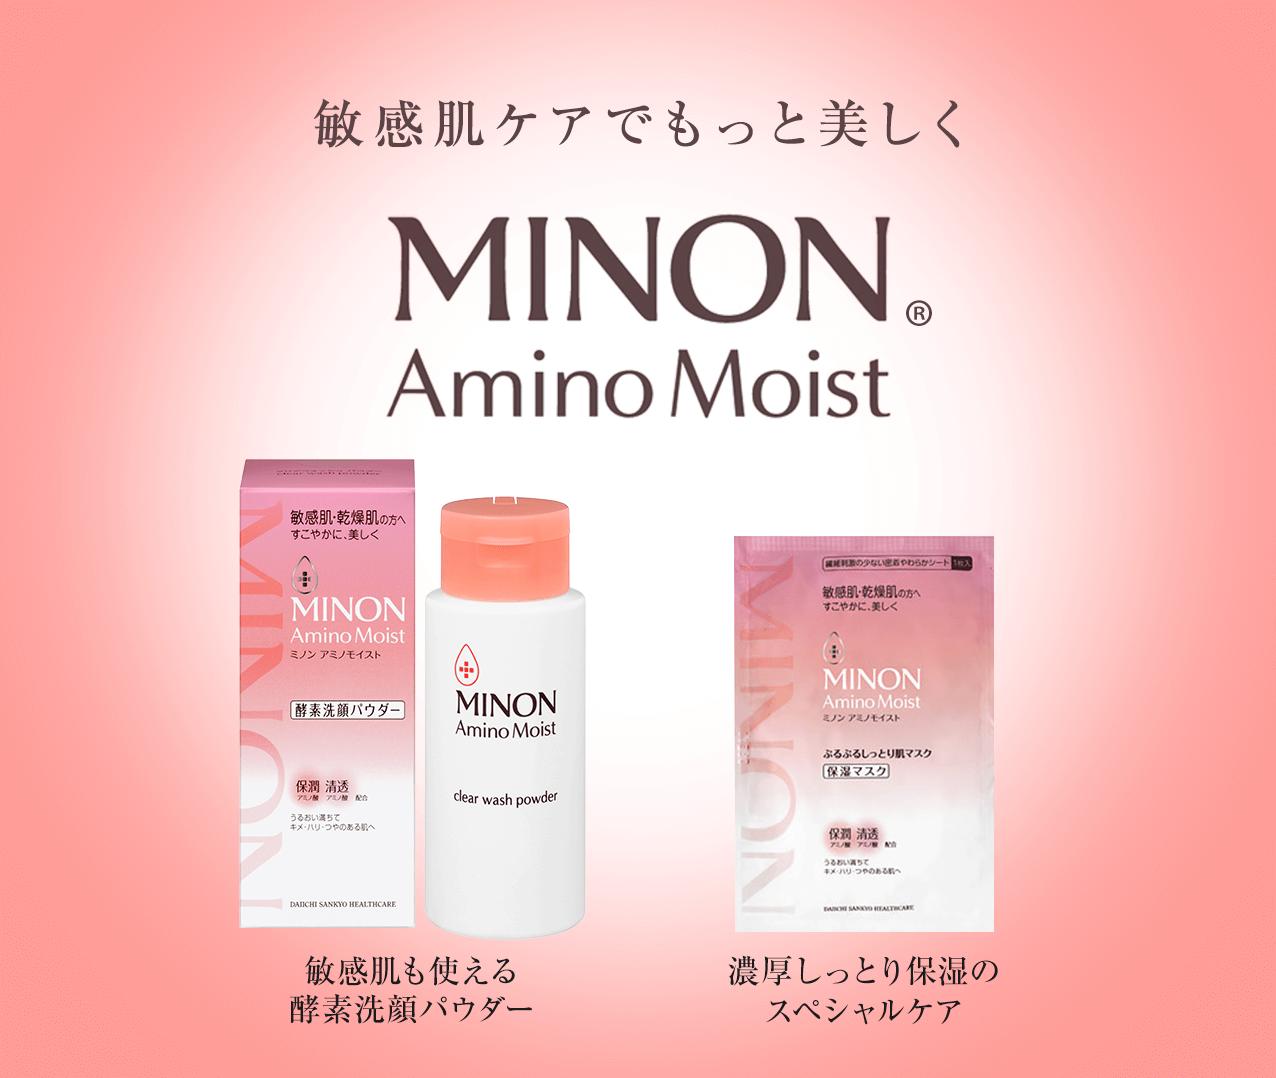 MINON amino moist 敏感肌ケアでもっと美しく 大人ニキビにお悩みの方に 肌の保湿に